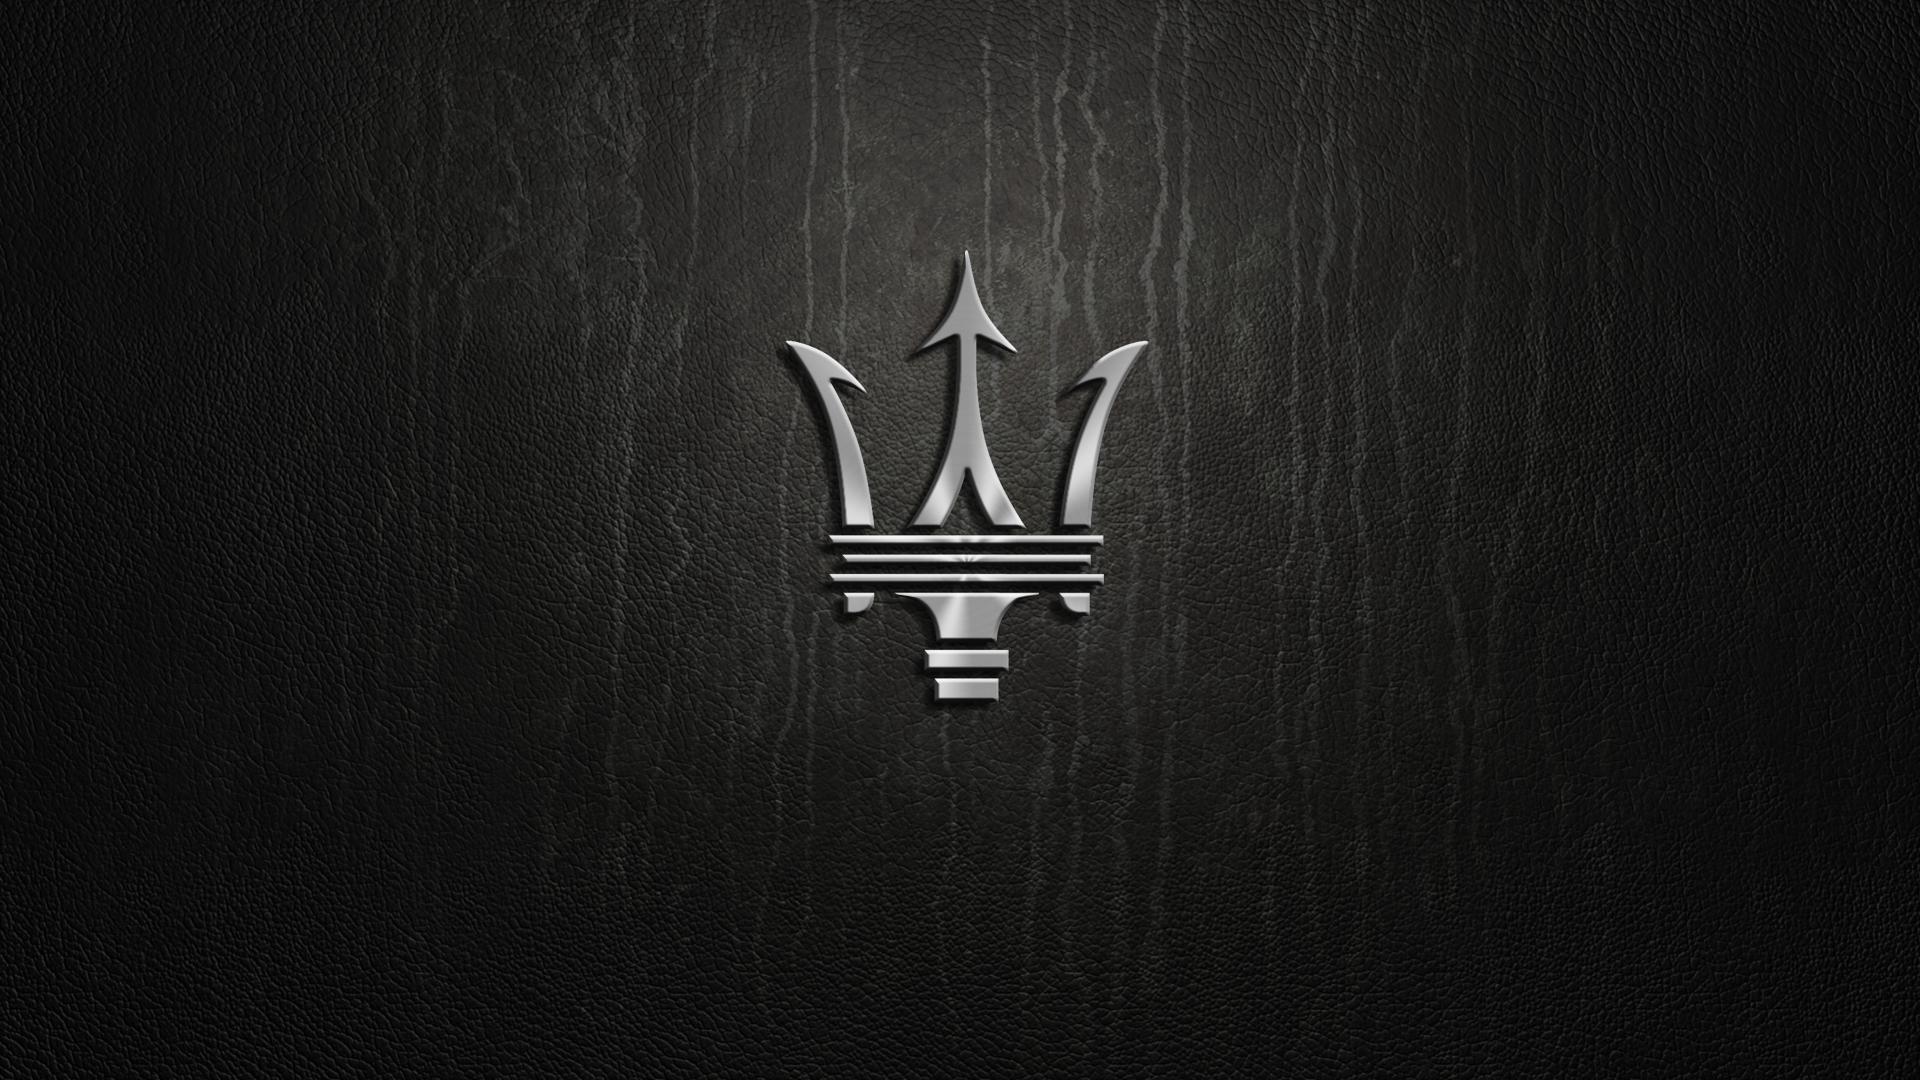 Maserati Logo Desktop Wallpaper 59088 1920x1080px 1920x1080